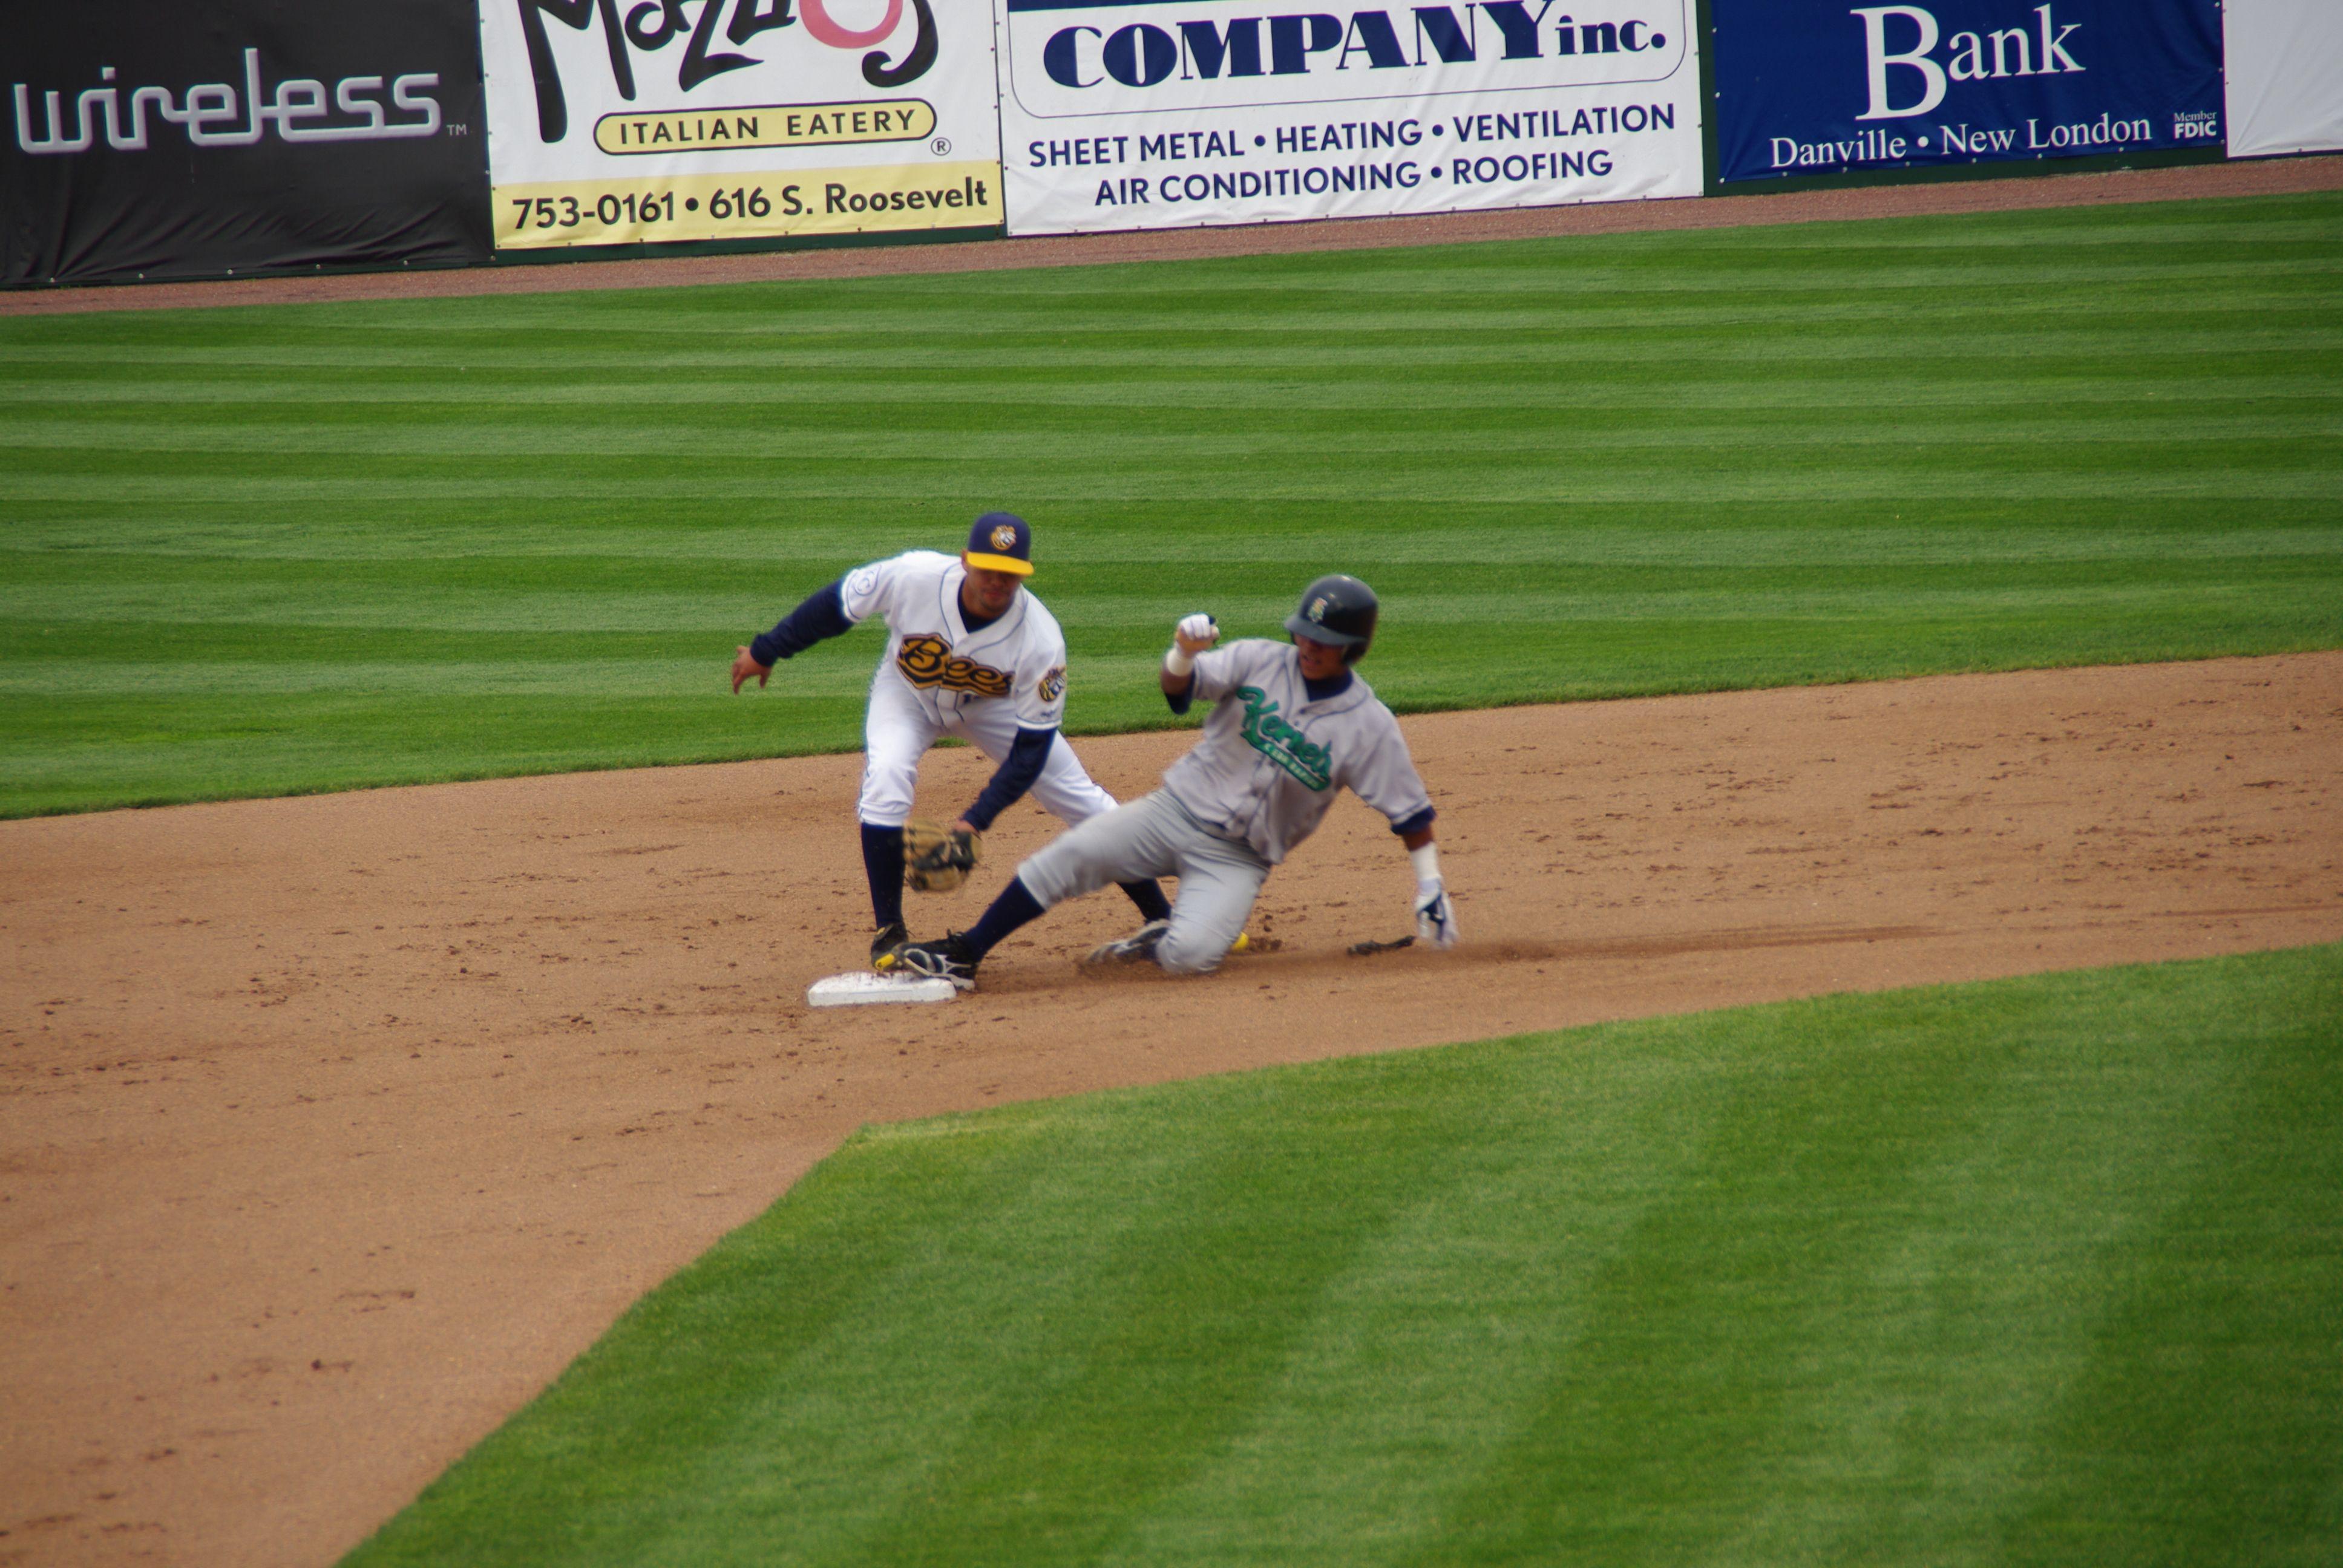 All Ages Of Baseball Fans Will Love Watching The Minor League Team The Burlington Bees Baseball Baseball Fan Baseball Field